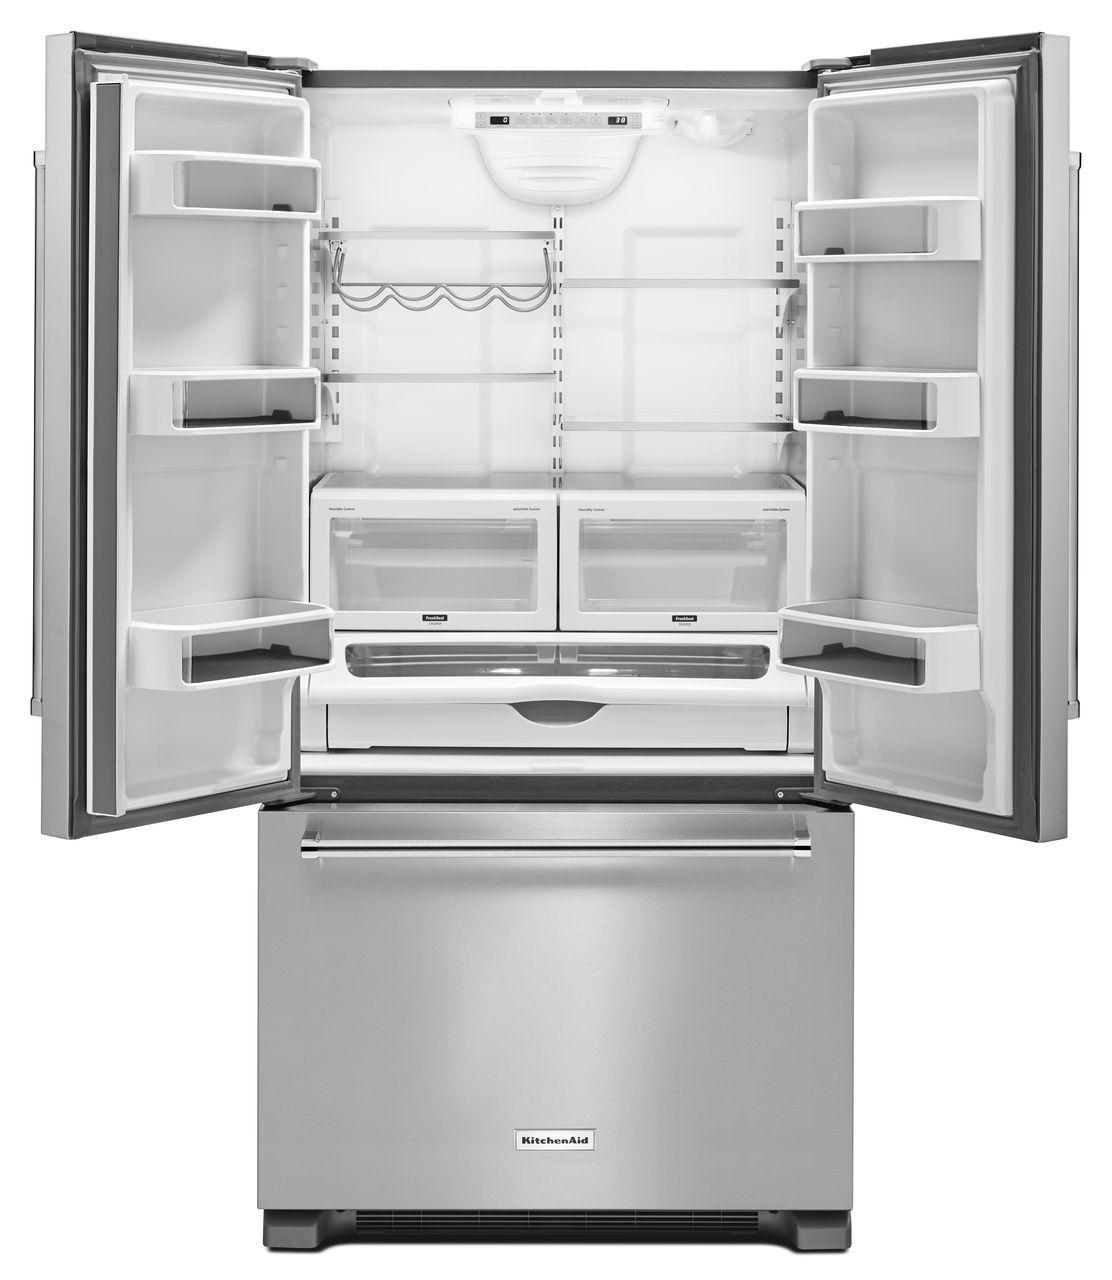 KitchenAid Overlay French Door Refrigerator - KRFC302EPA